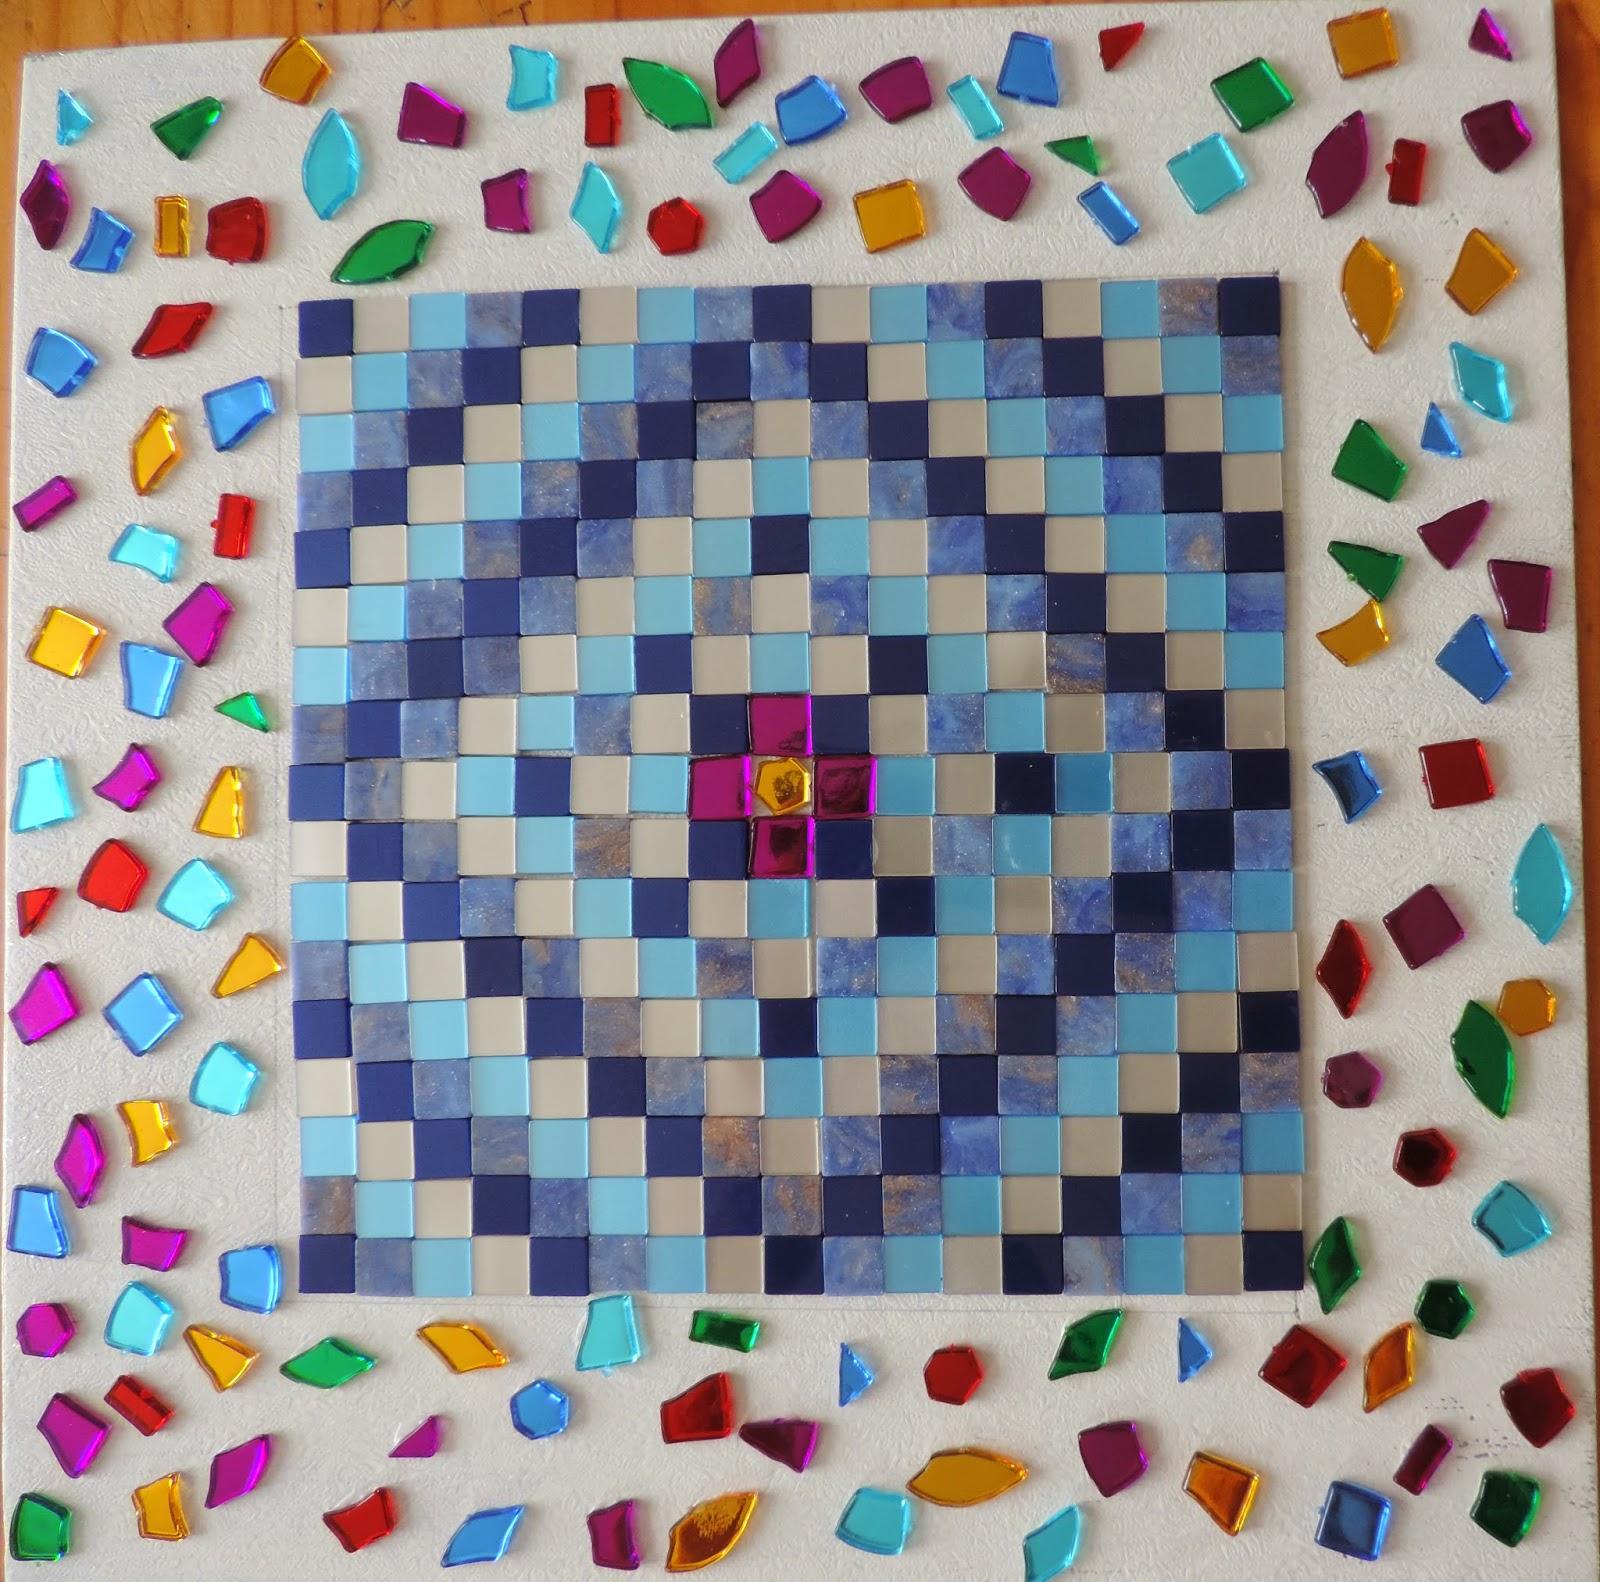 hobbycraft mosaic tessellated design